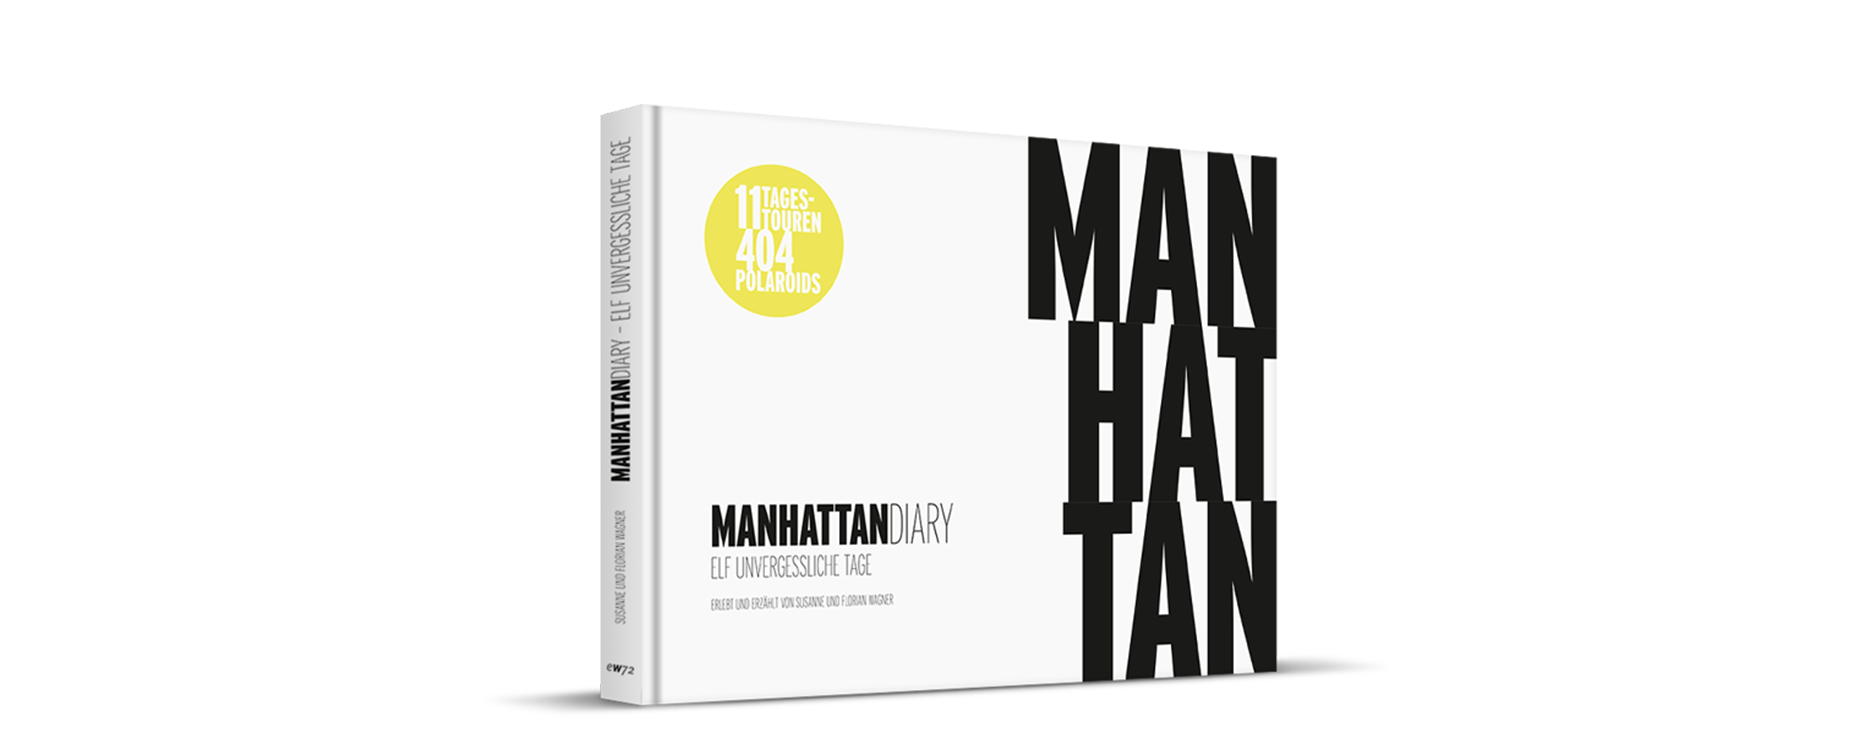 Manhattan_Diary_25_Titel-Gallerie-EW72.png